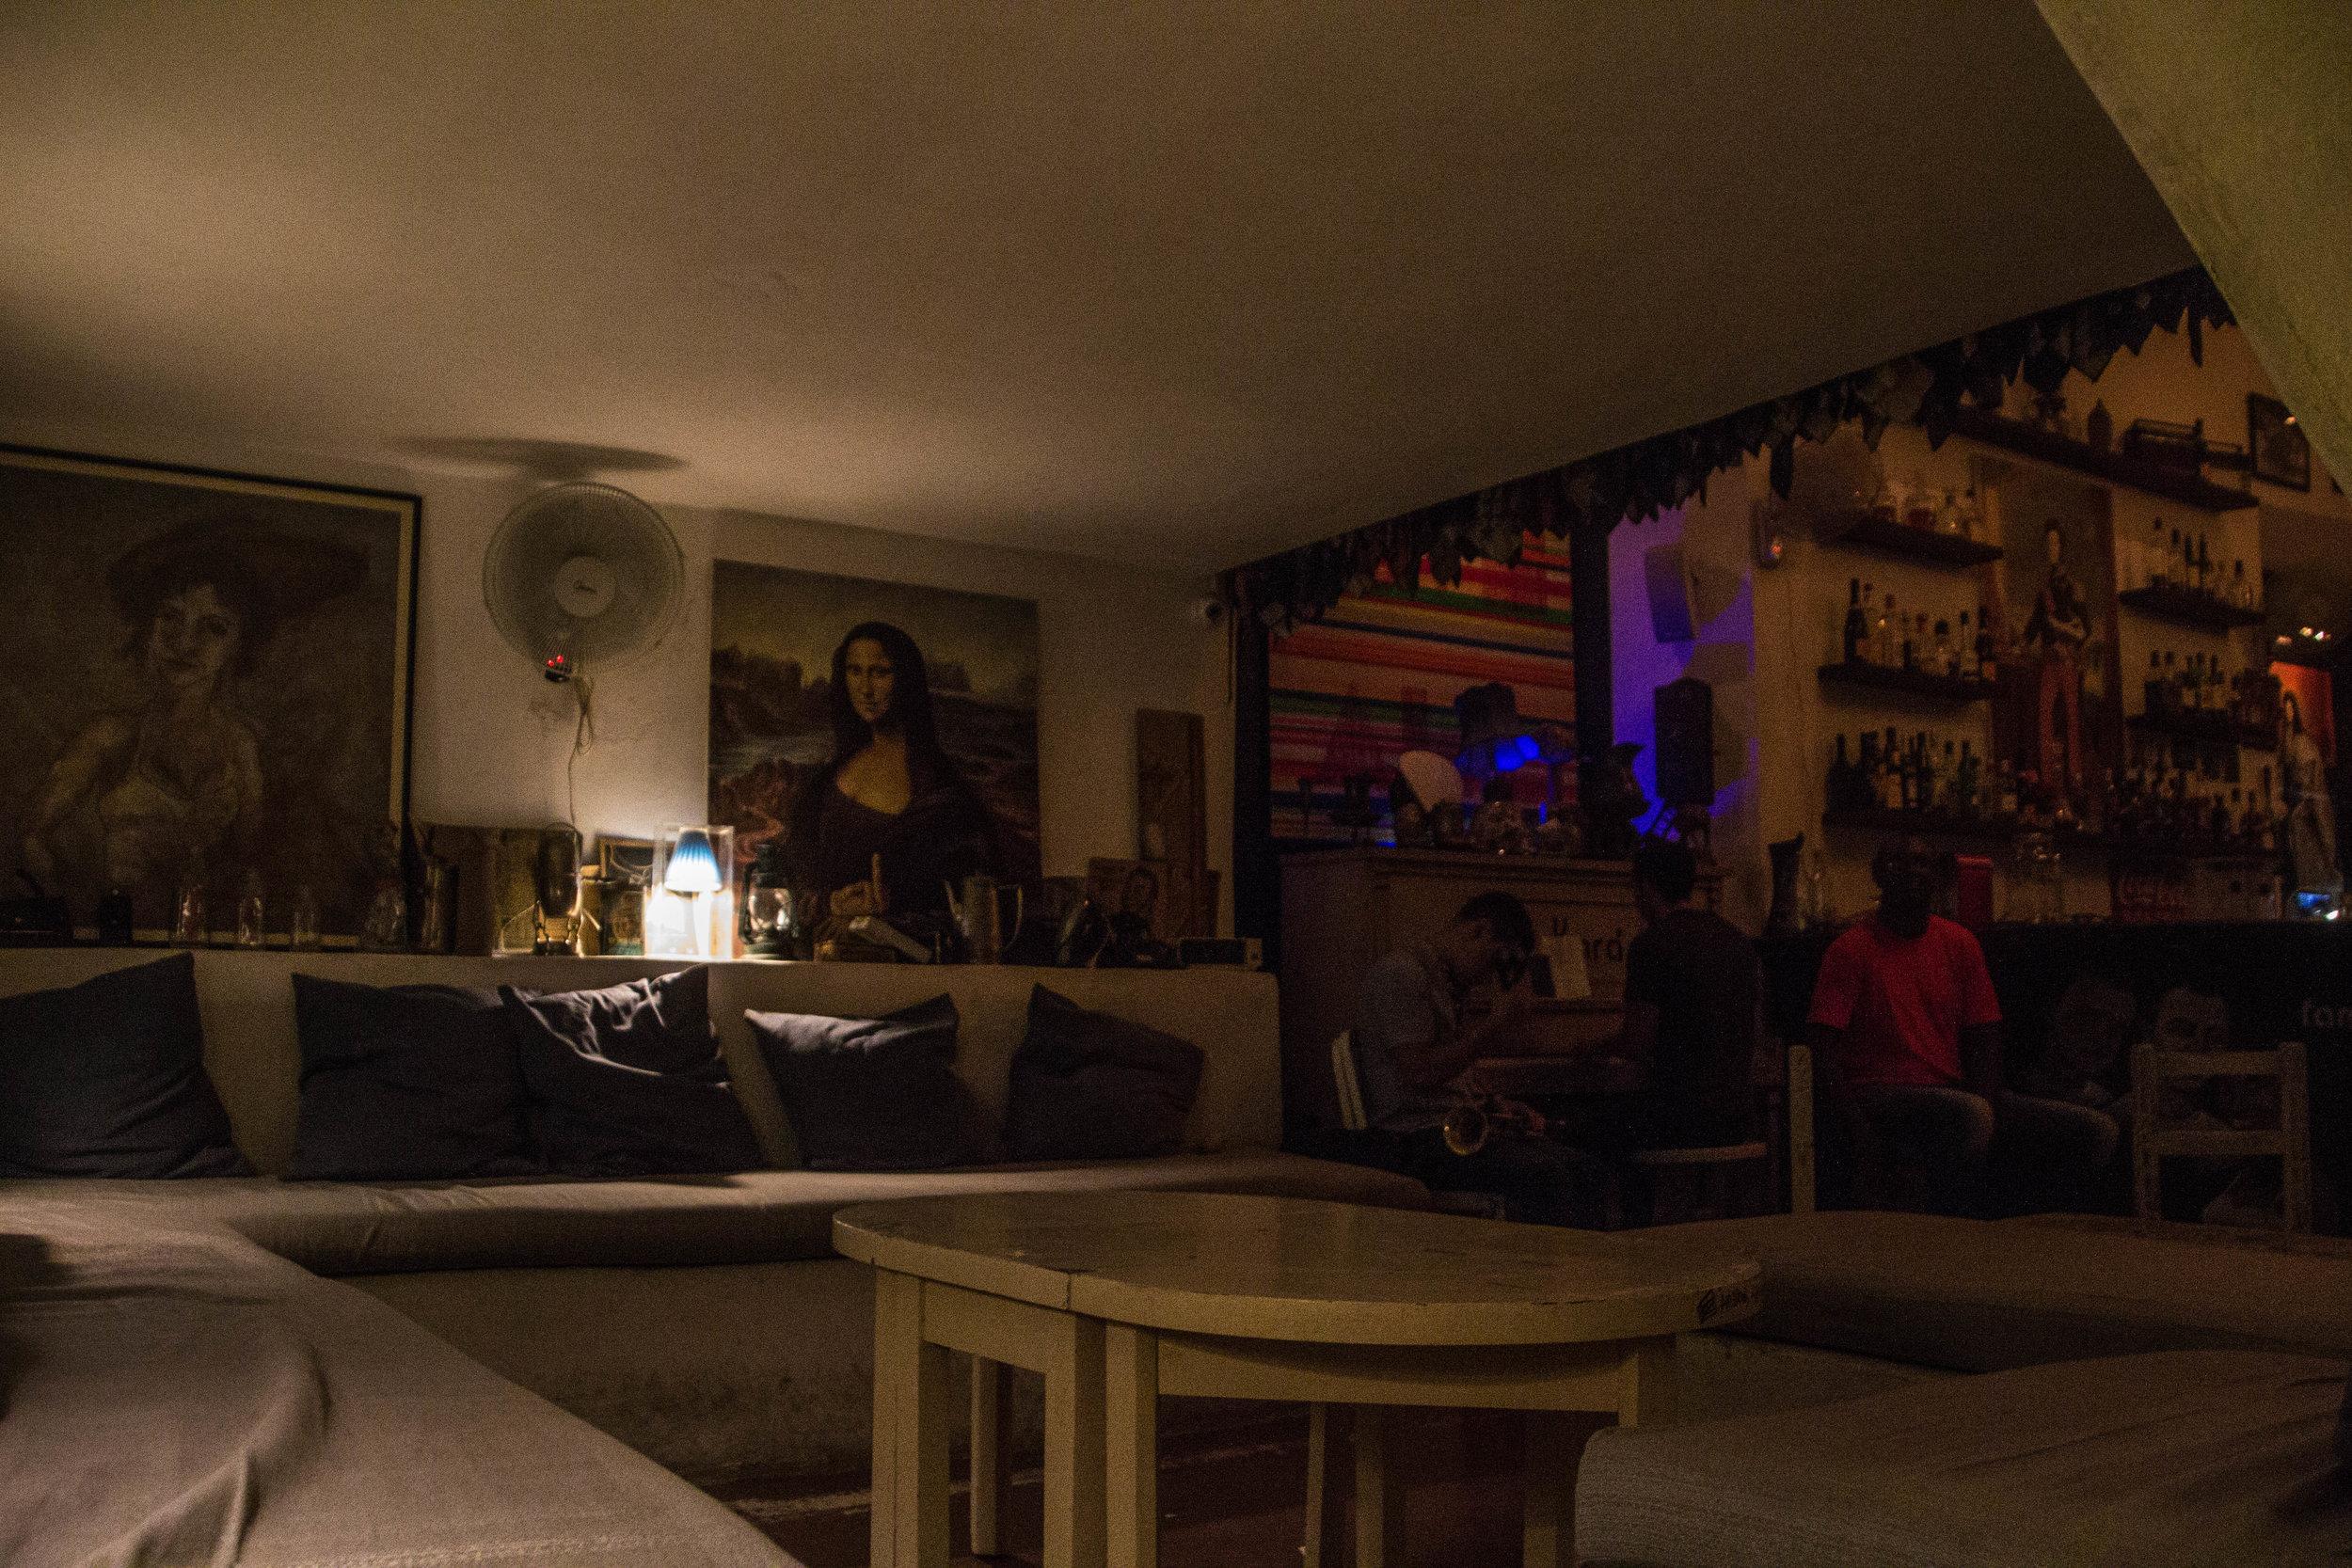 sia kara cafe havana nightlife cuba-1-2-2.jpg